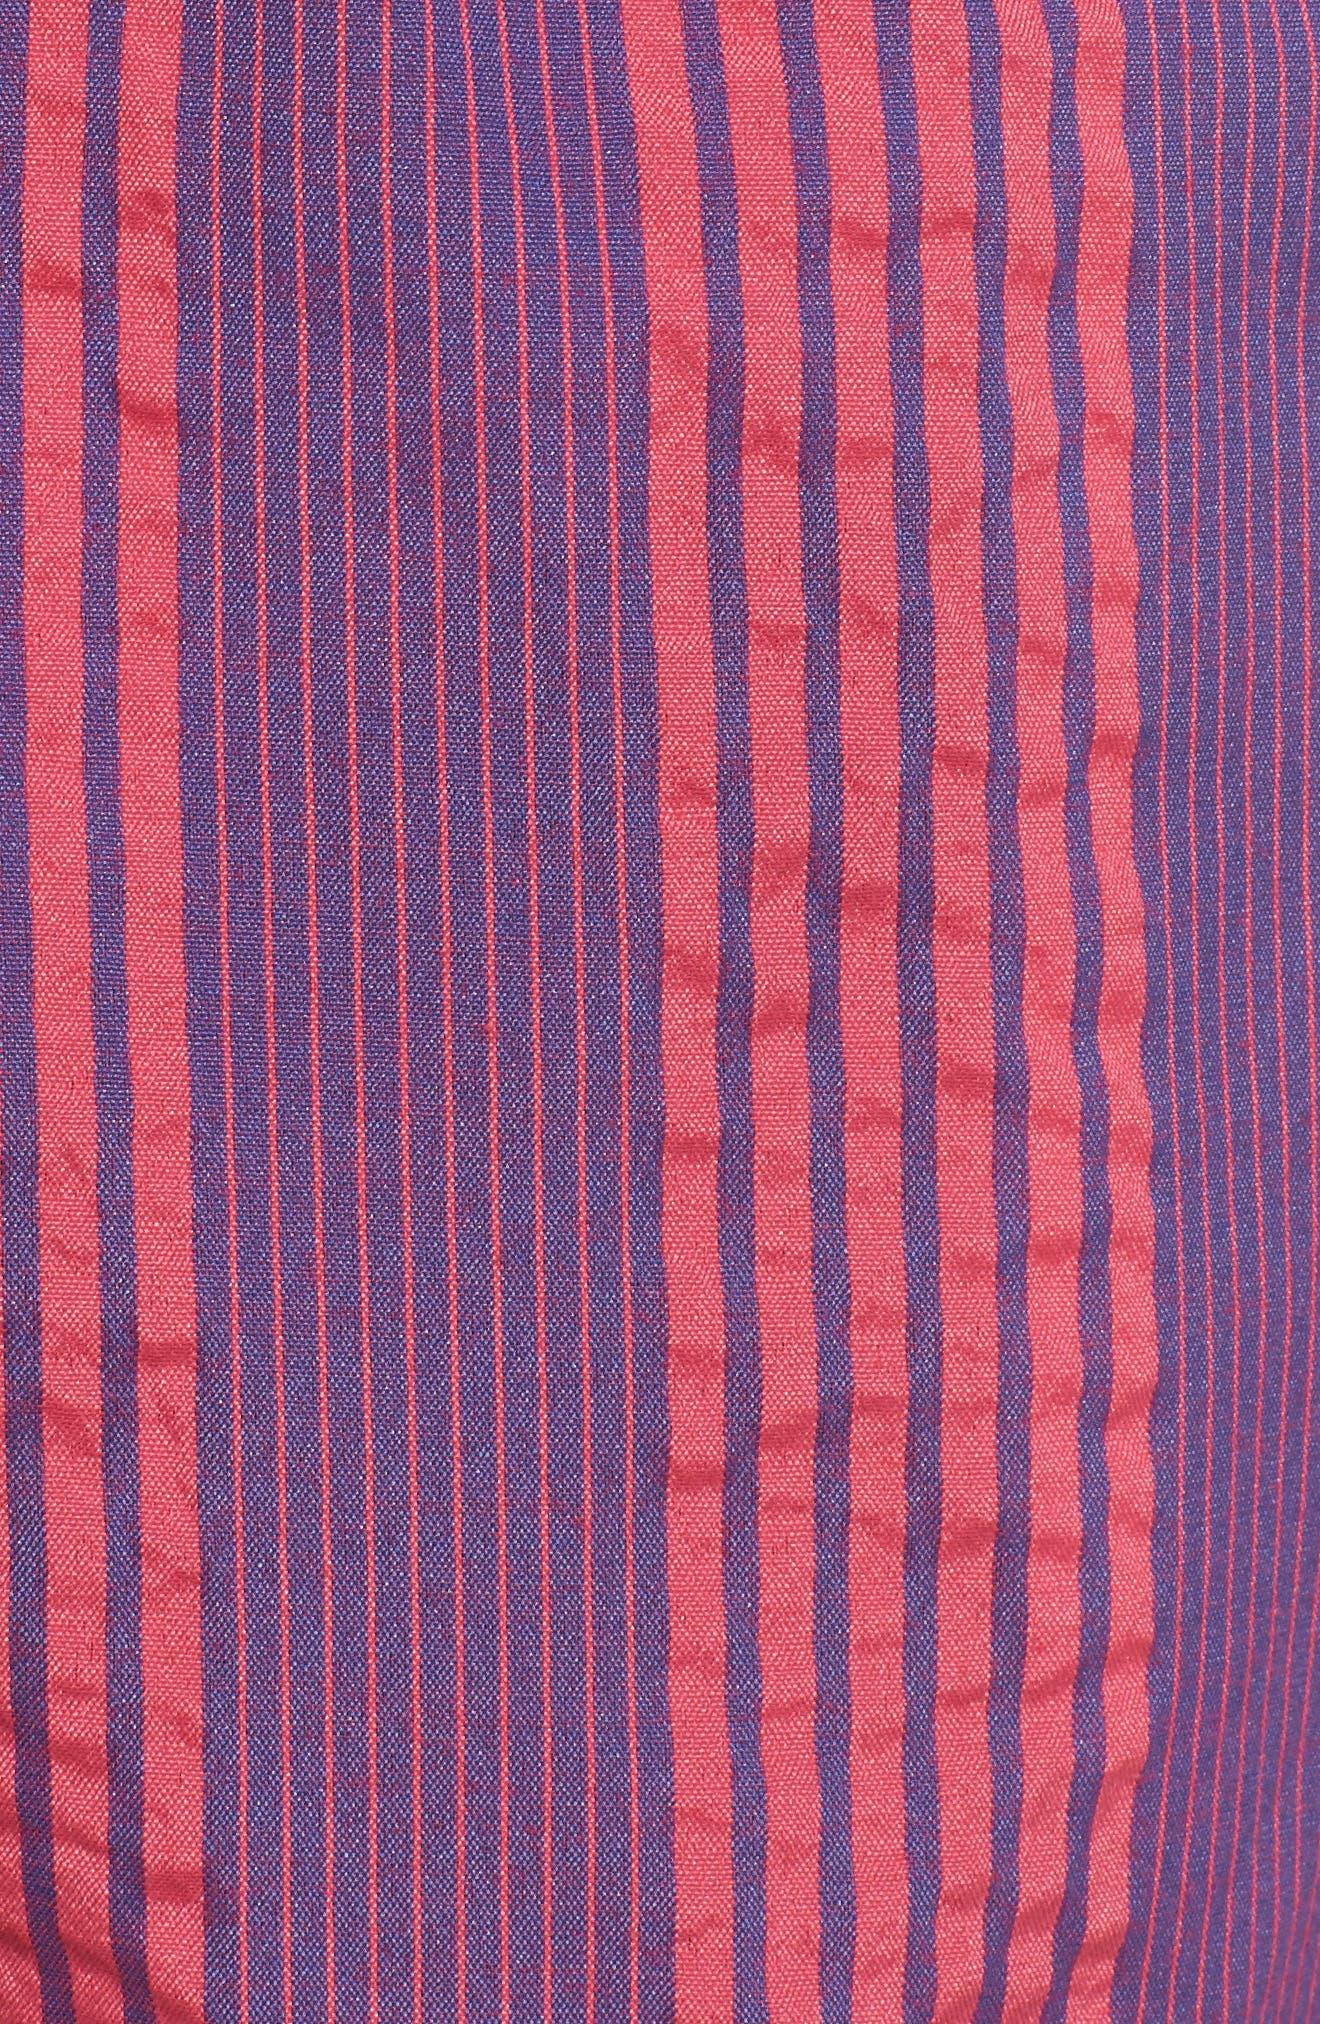 Premium Sano Swim Trunks,                             Alternate thumbnail 5, color,                             TWILIGHT/ BRIGHT CORAL